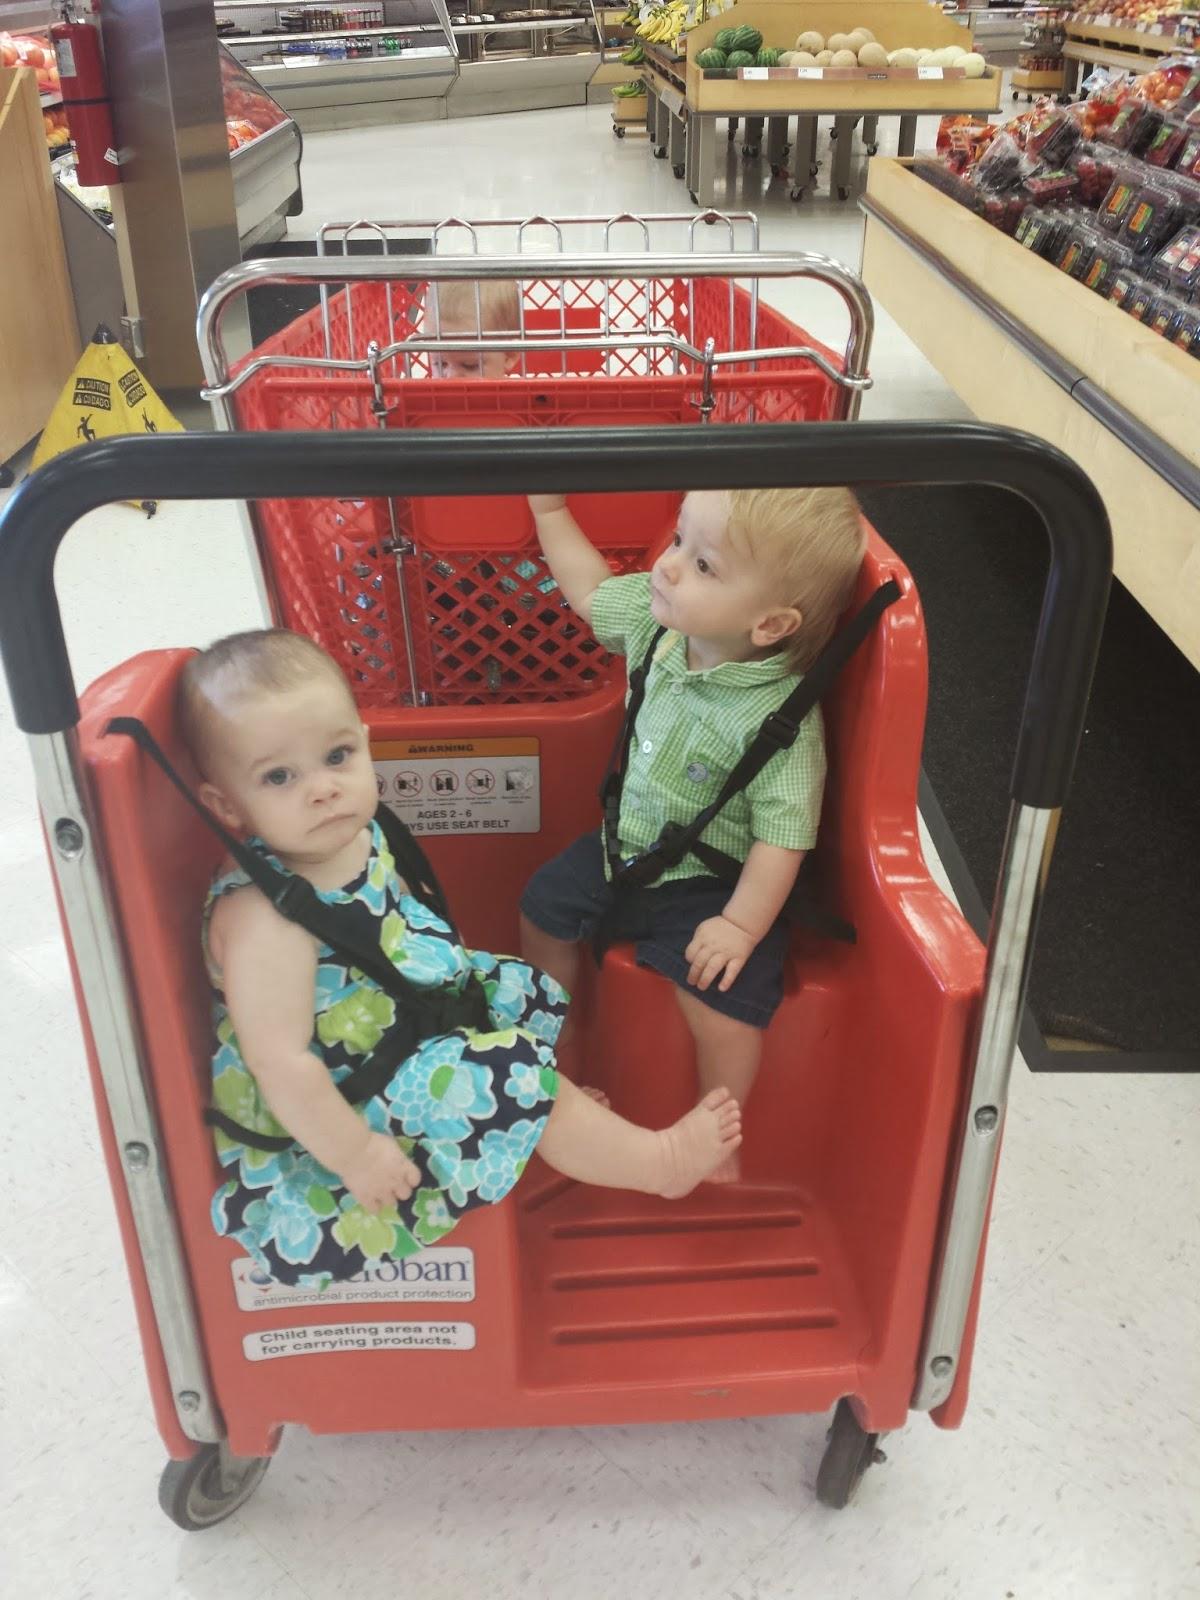 Groovy Triplets Toddler Target Vs Walmart Shopping Carts Funny Birthday Cards Online Drosicarndamsfinfo